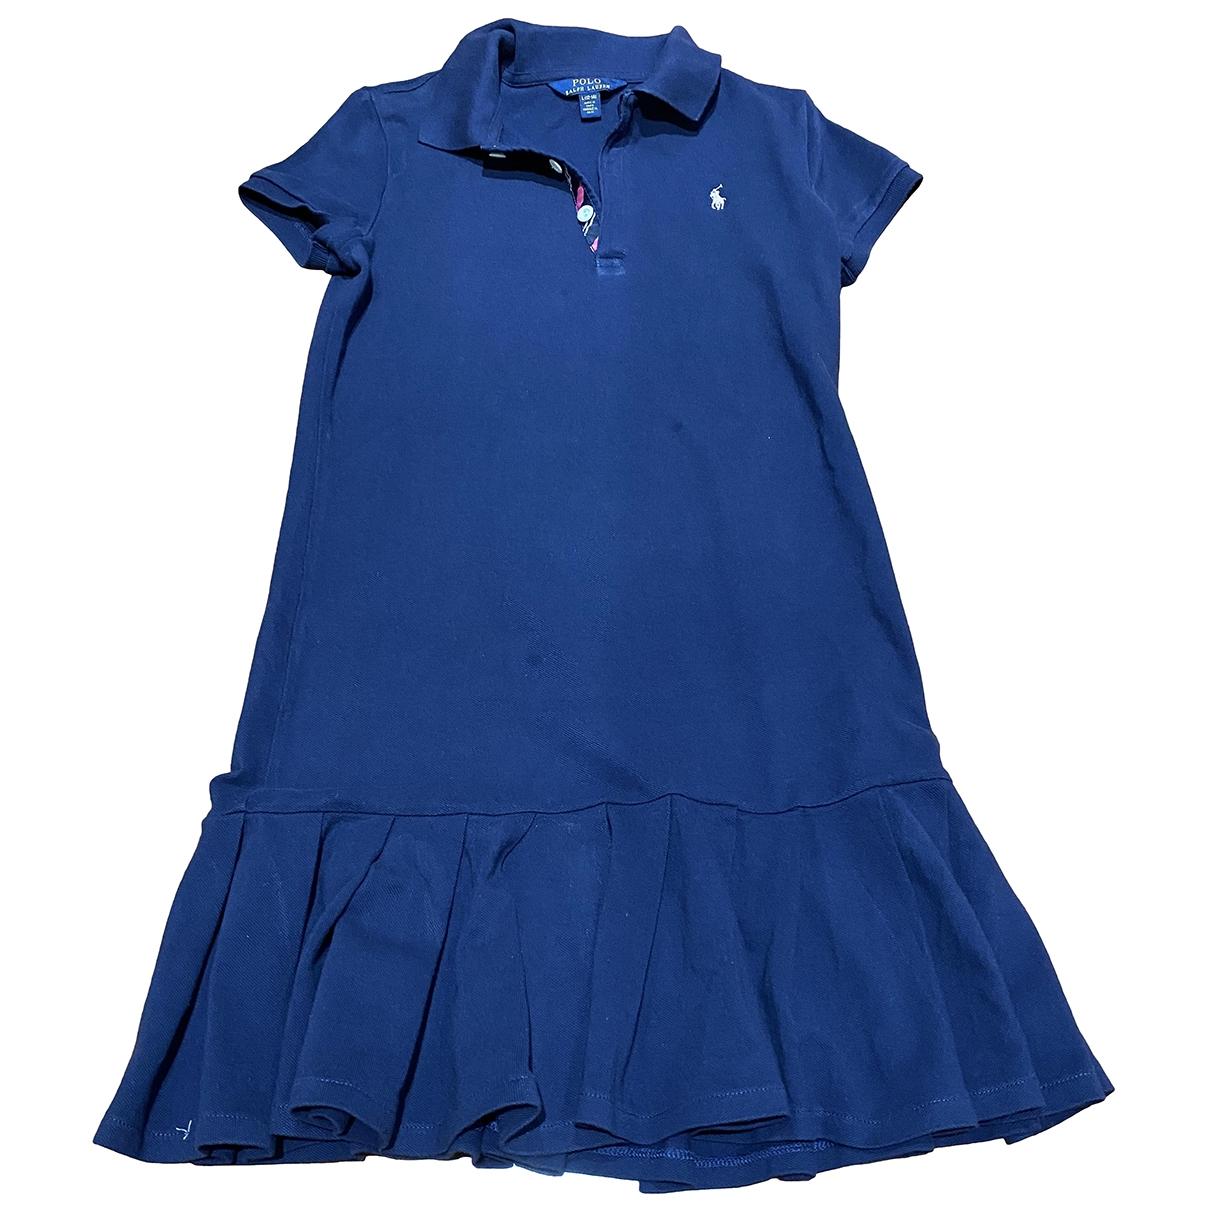 Polo Ralph Lauren \N Blue Cotton dress for Kids 12 years - XS UK